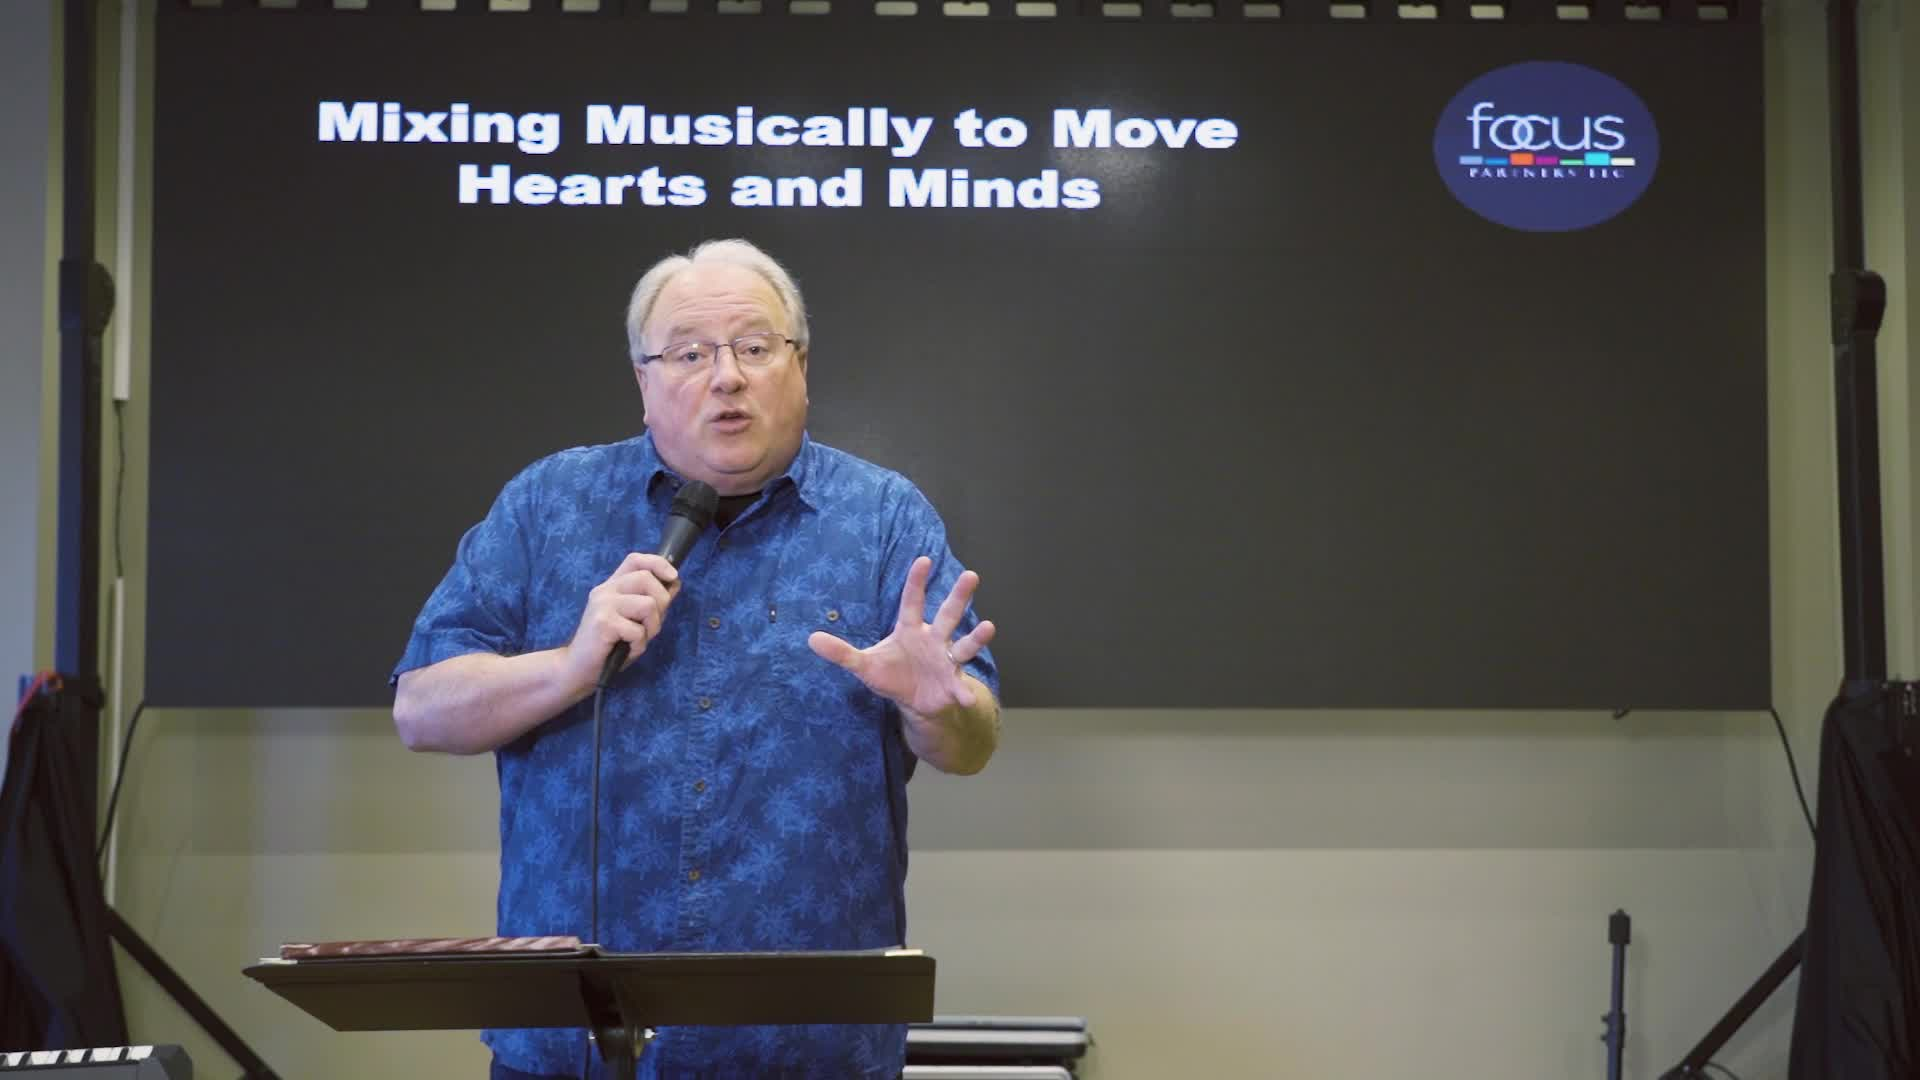 Matt Brown - Dartnall - Dave - Mixing Musically to Move Hearts and Minds